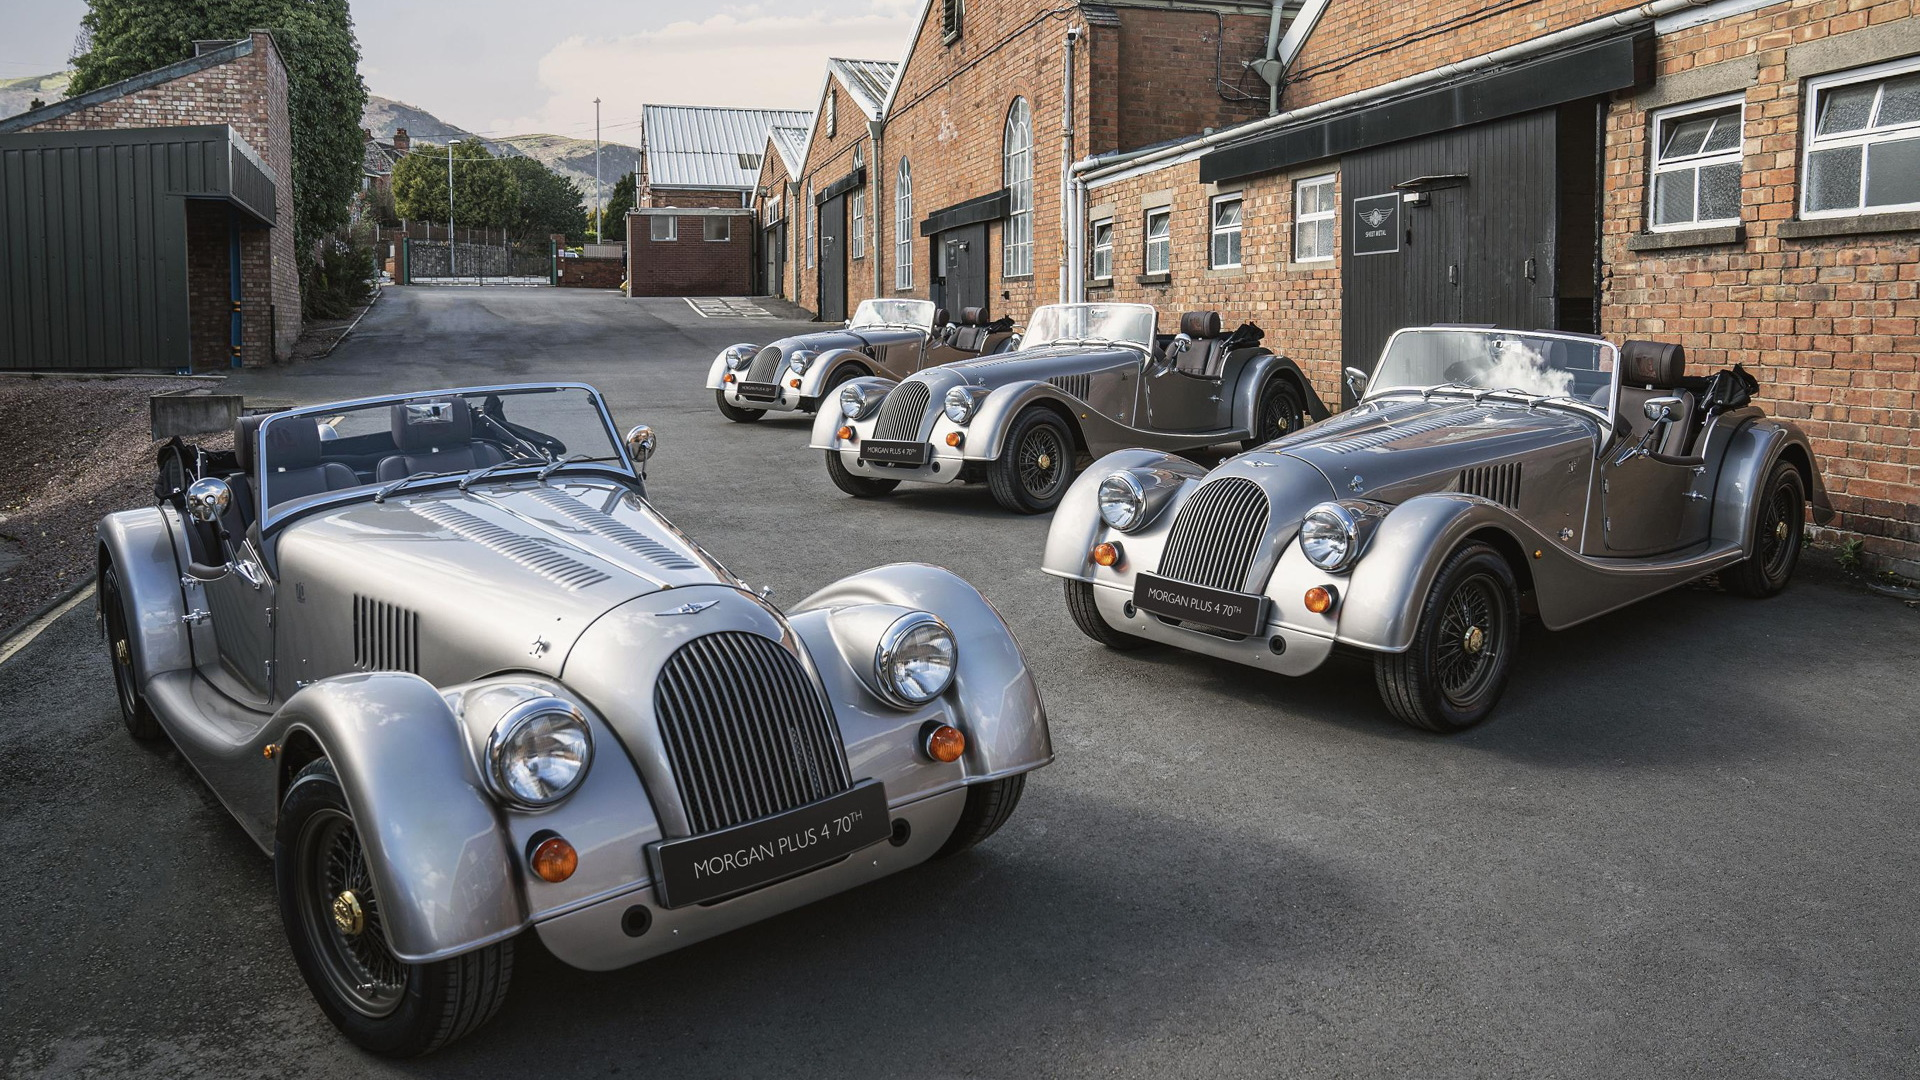 Morgan Plus 4 70th Anniversary Edition